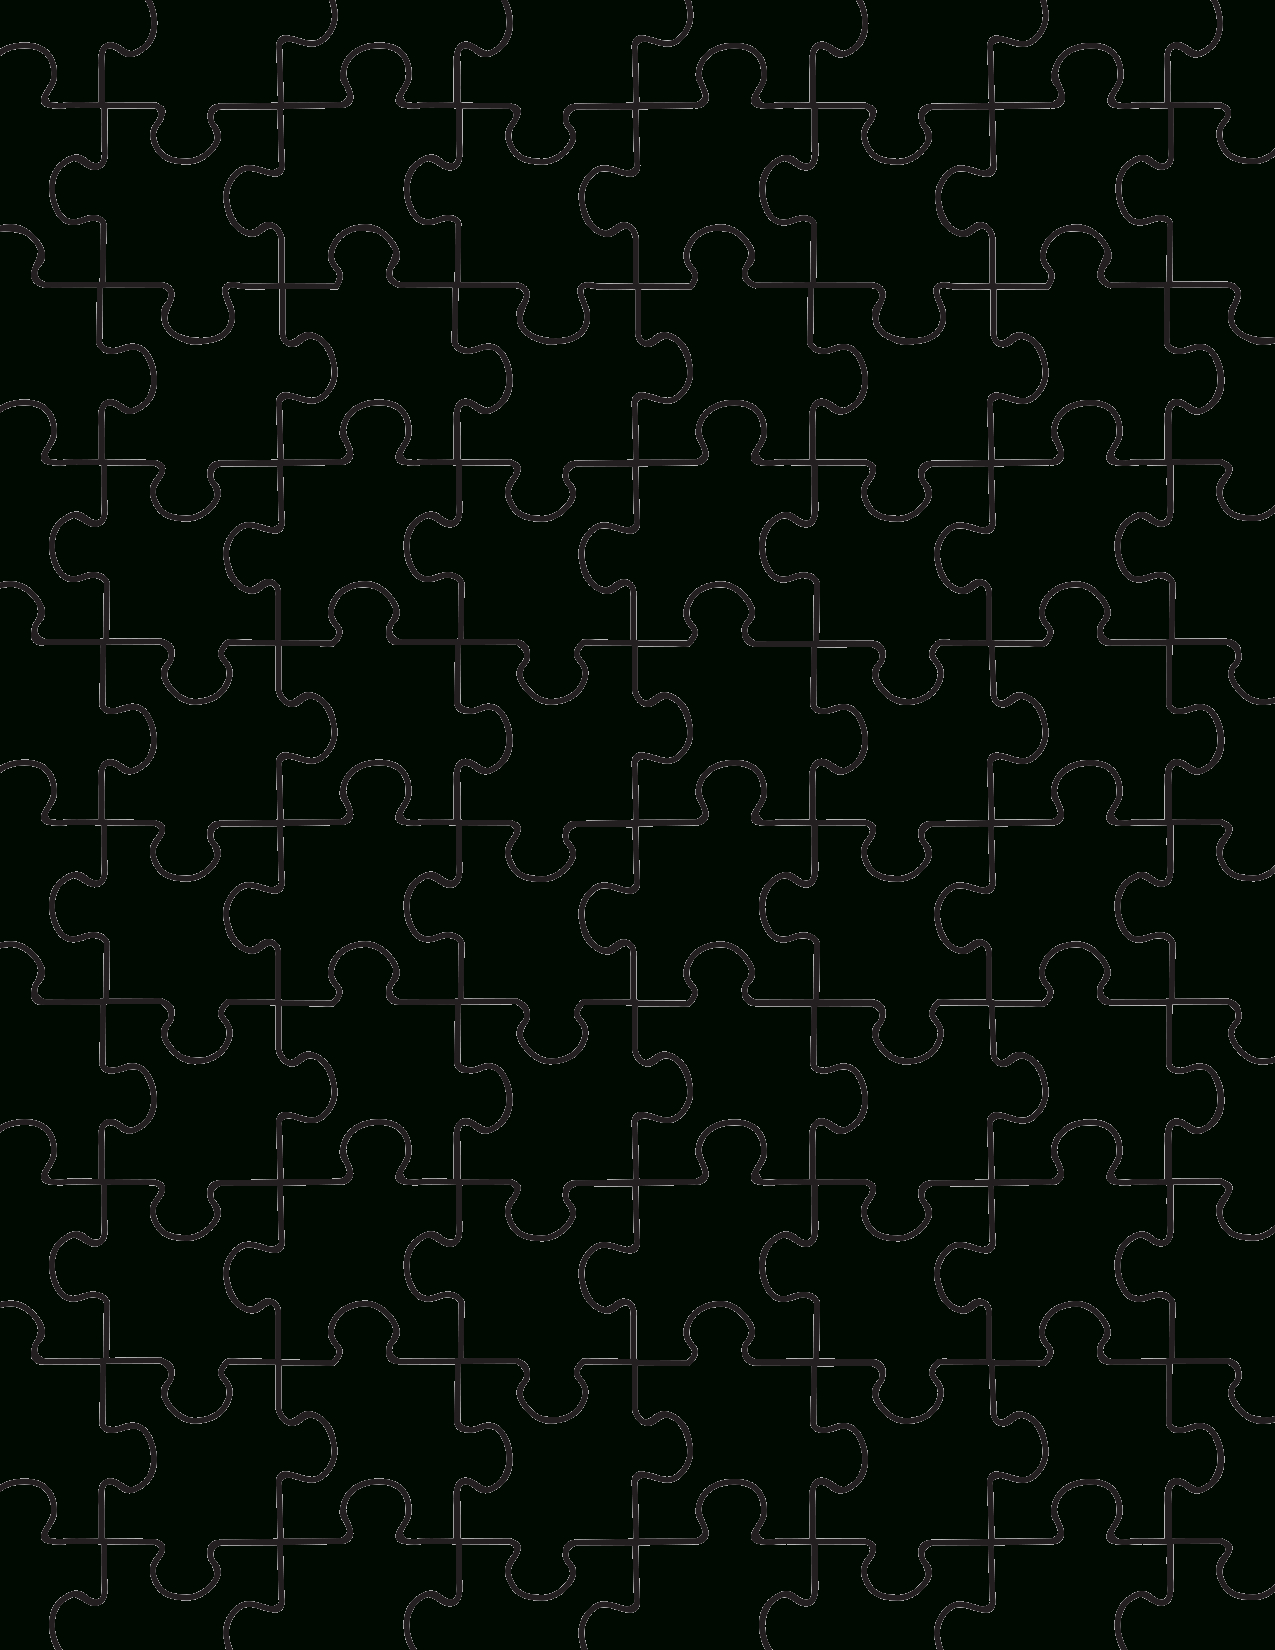 Printable Puzzle Pieces Template | Lovetoknow - Printable Puzzle Pieces Pdf